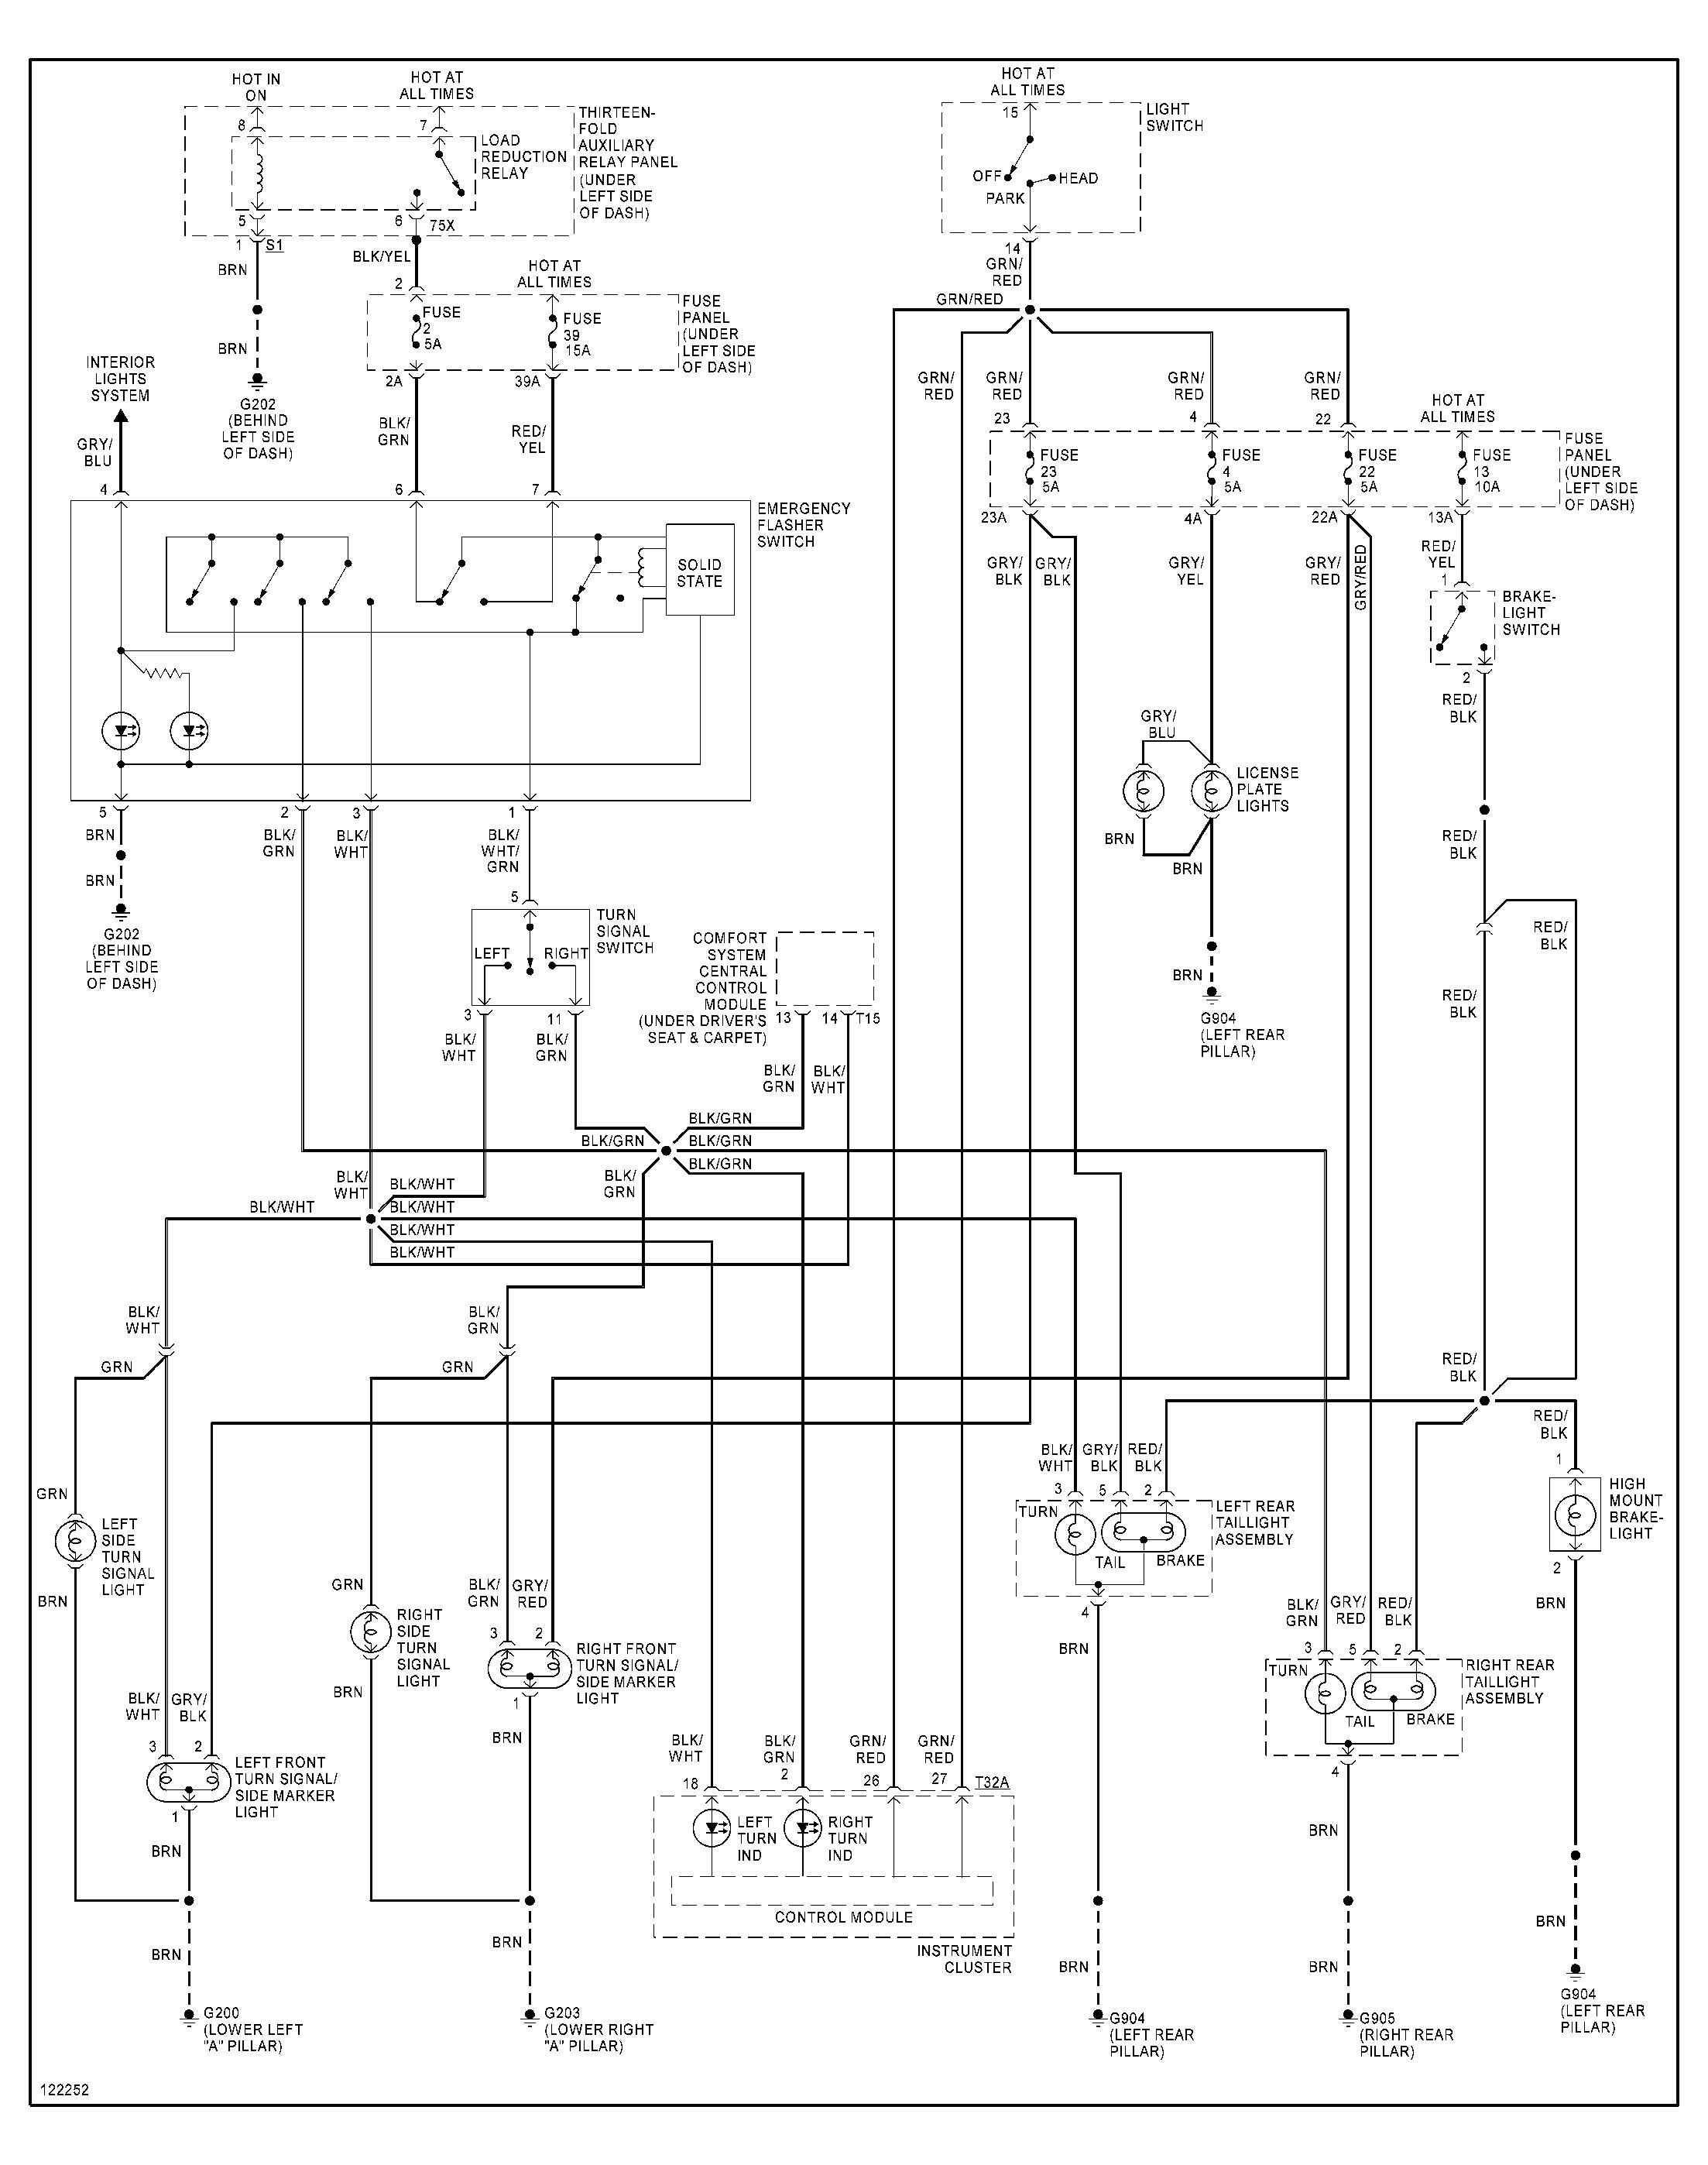 2008 vw wiring diagram wiring diagram rows 2008 vw rabbit radio wiring diagram 2008 vw wiring diagram